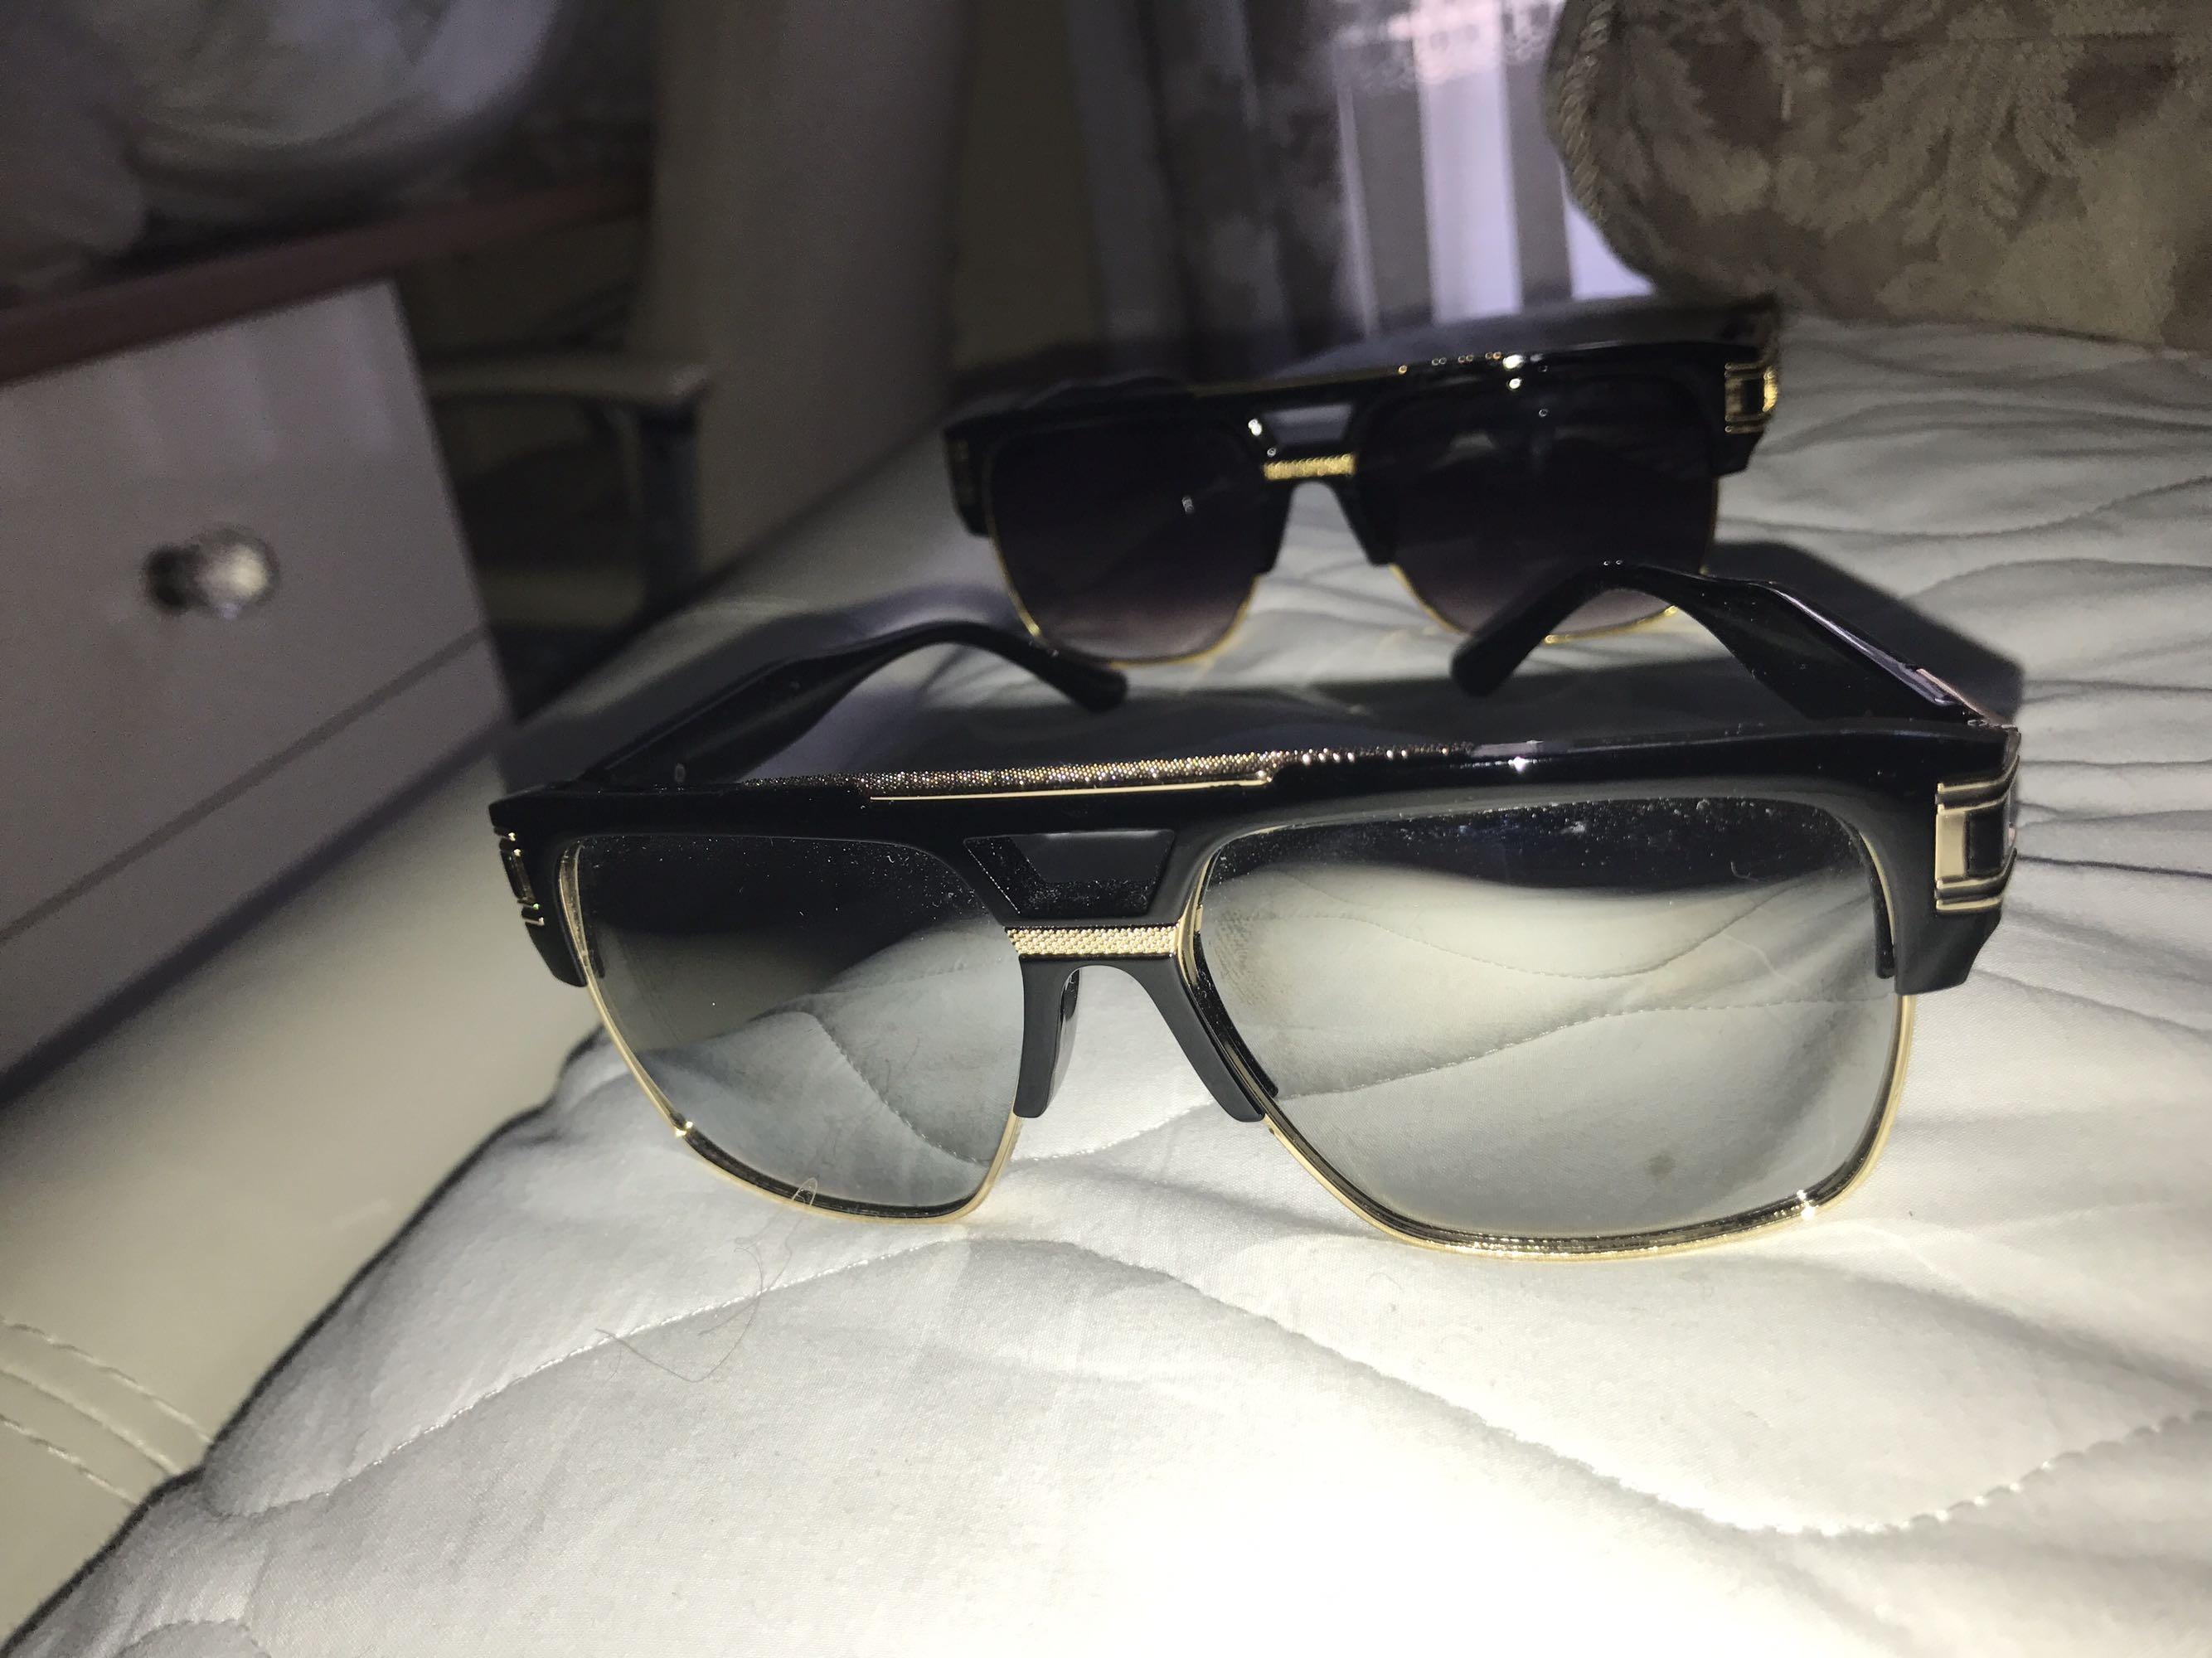 Grandmaster 4 sunglasses